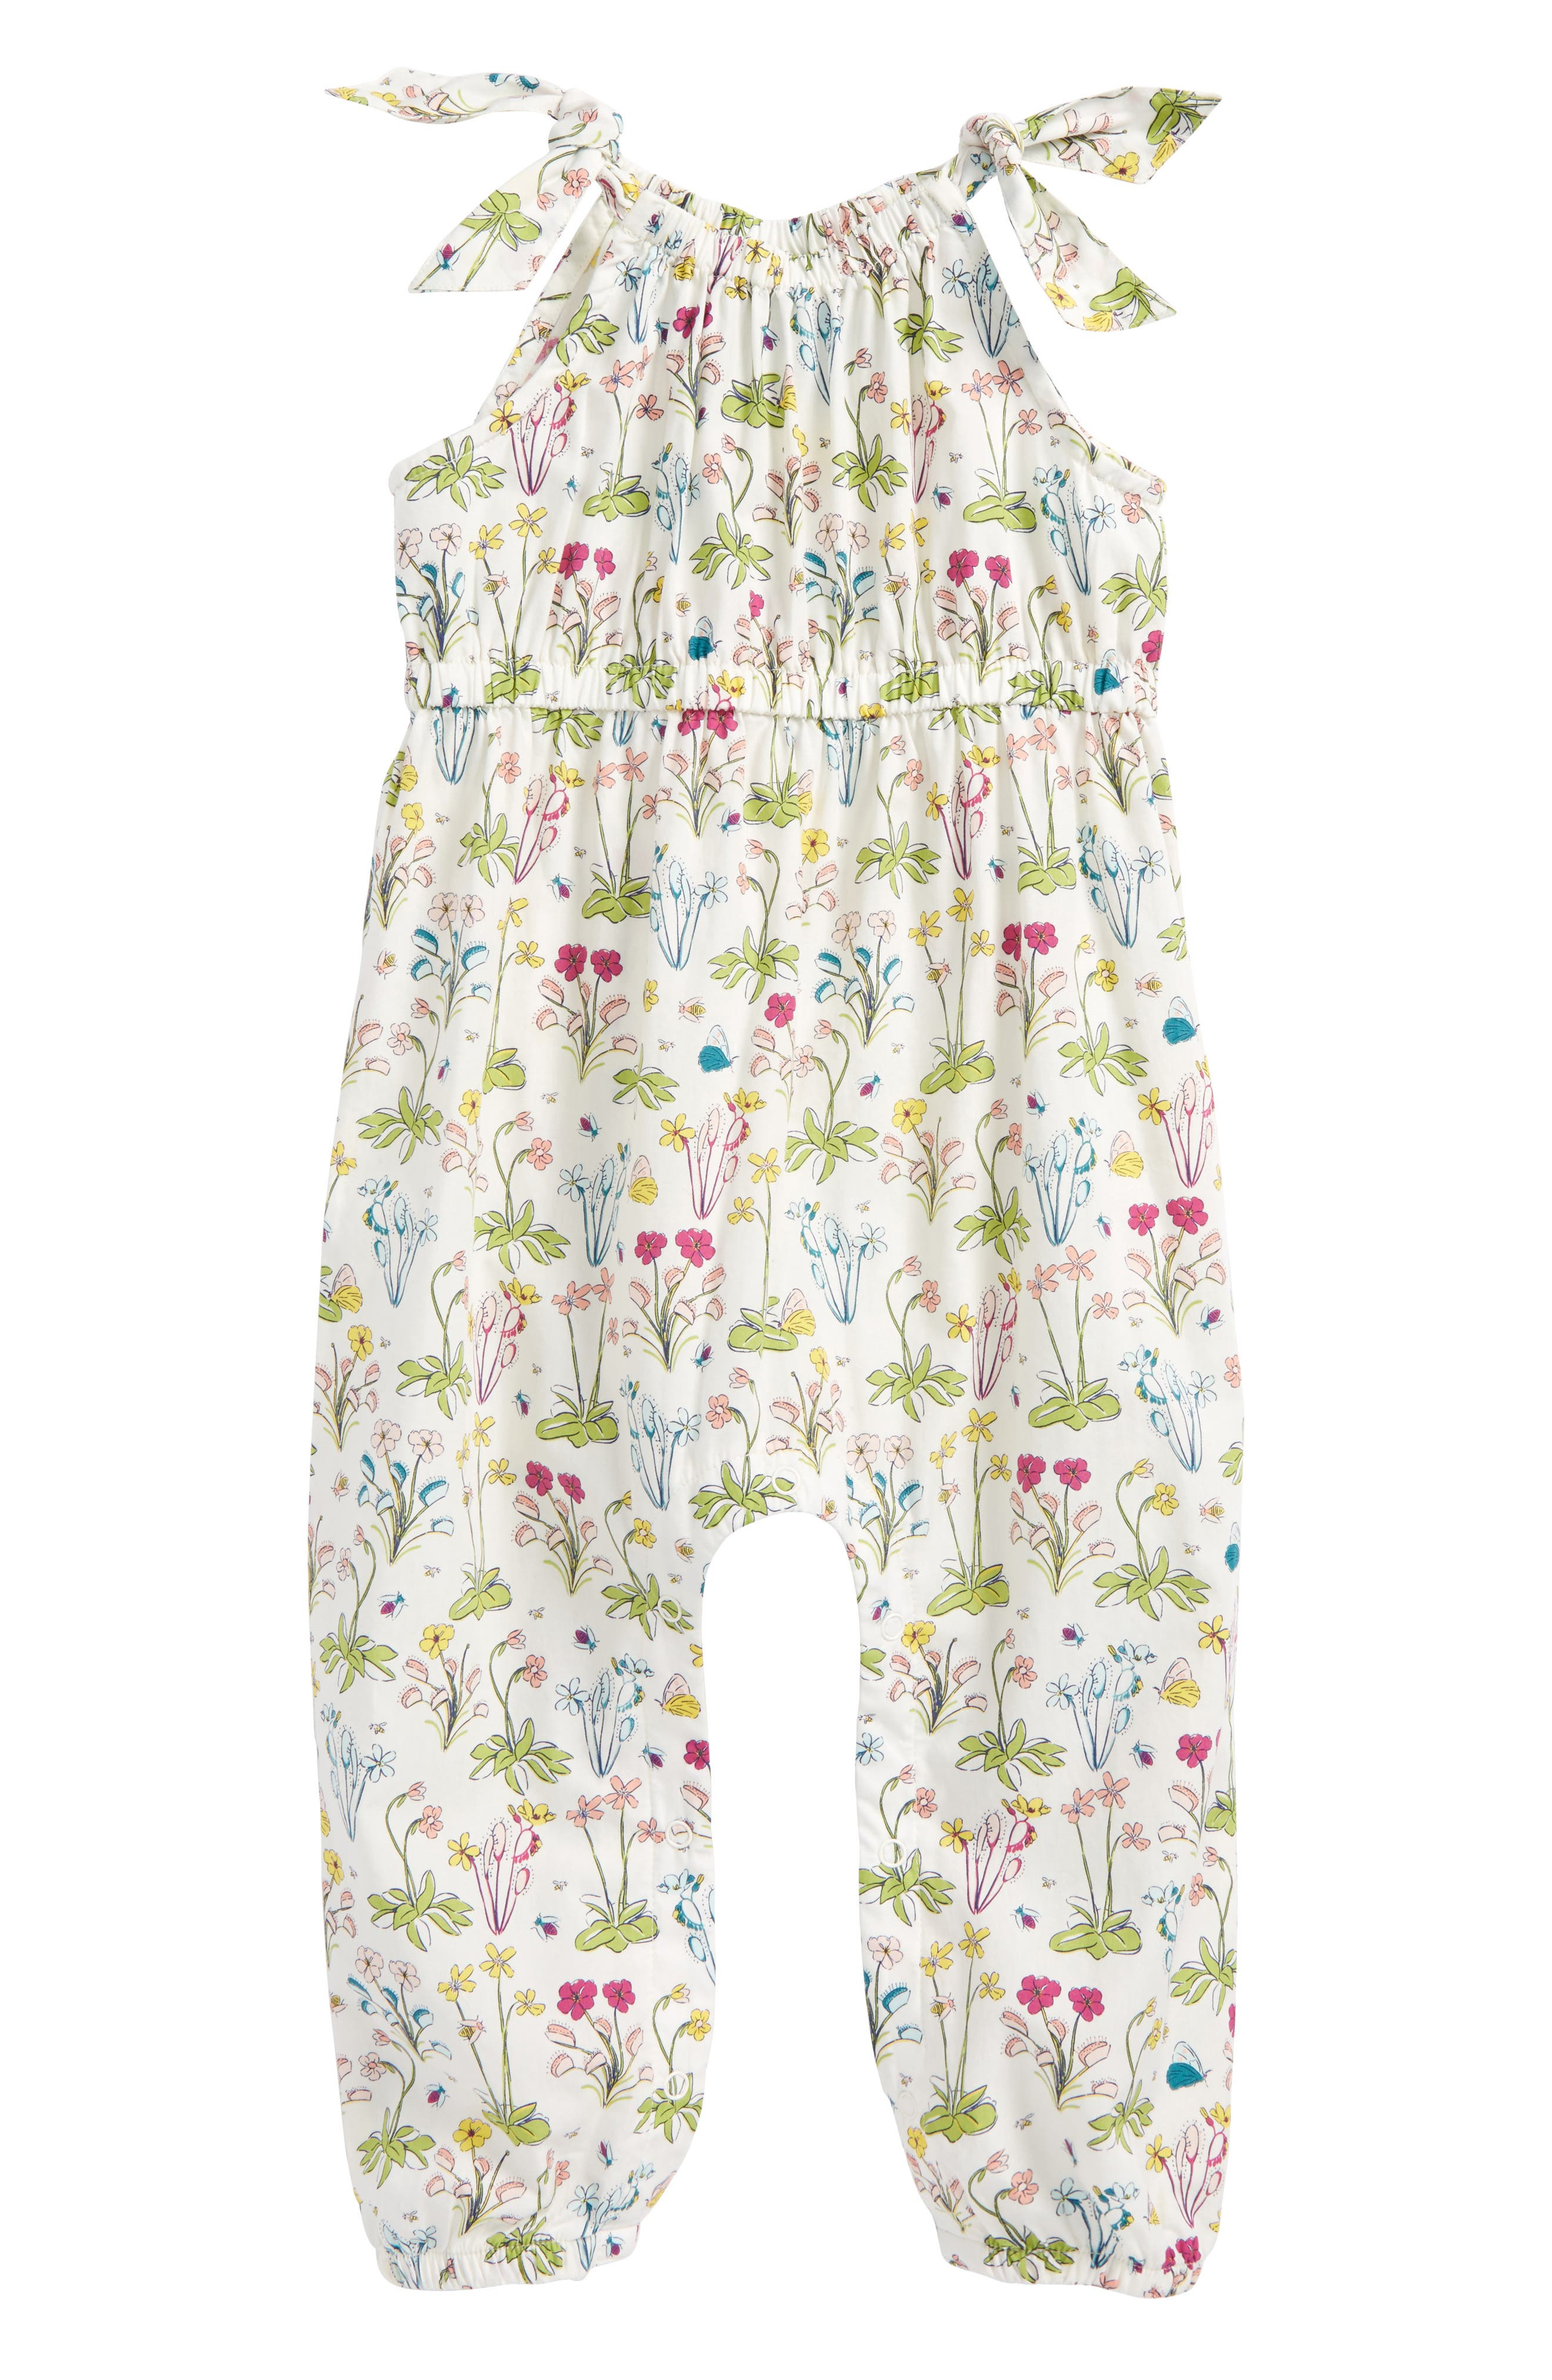 Alternate Image 1 Selected - Tea Collection Shoulder Tie Romper (Baby Girls)